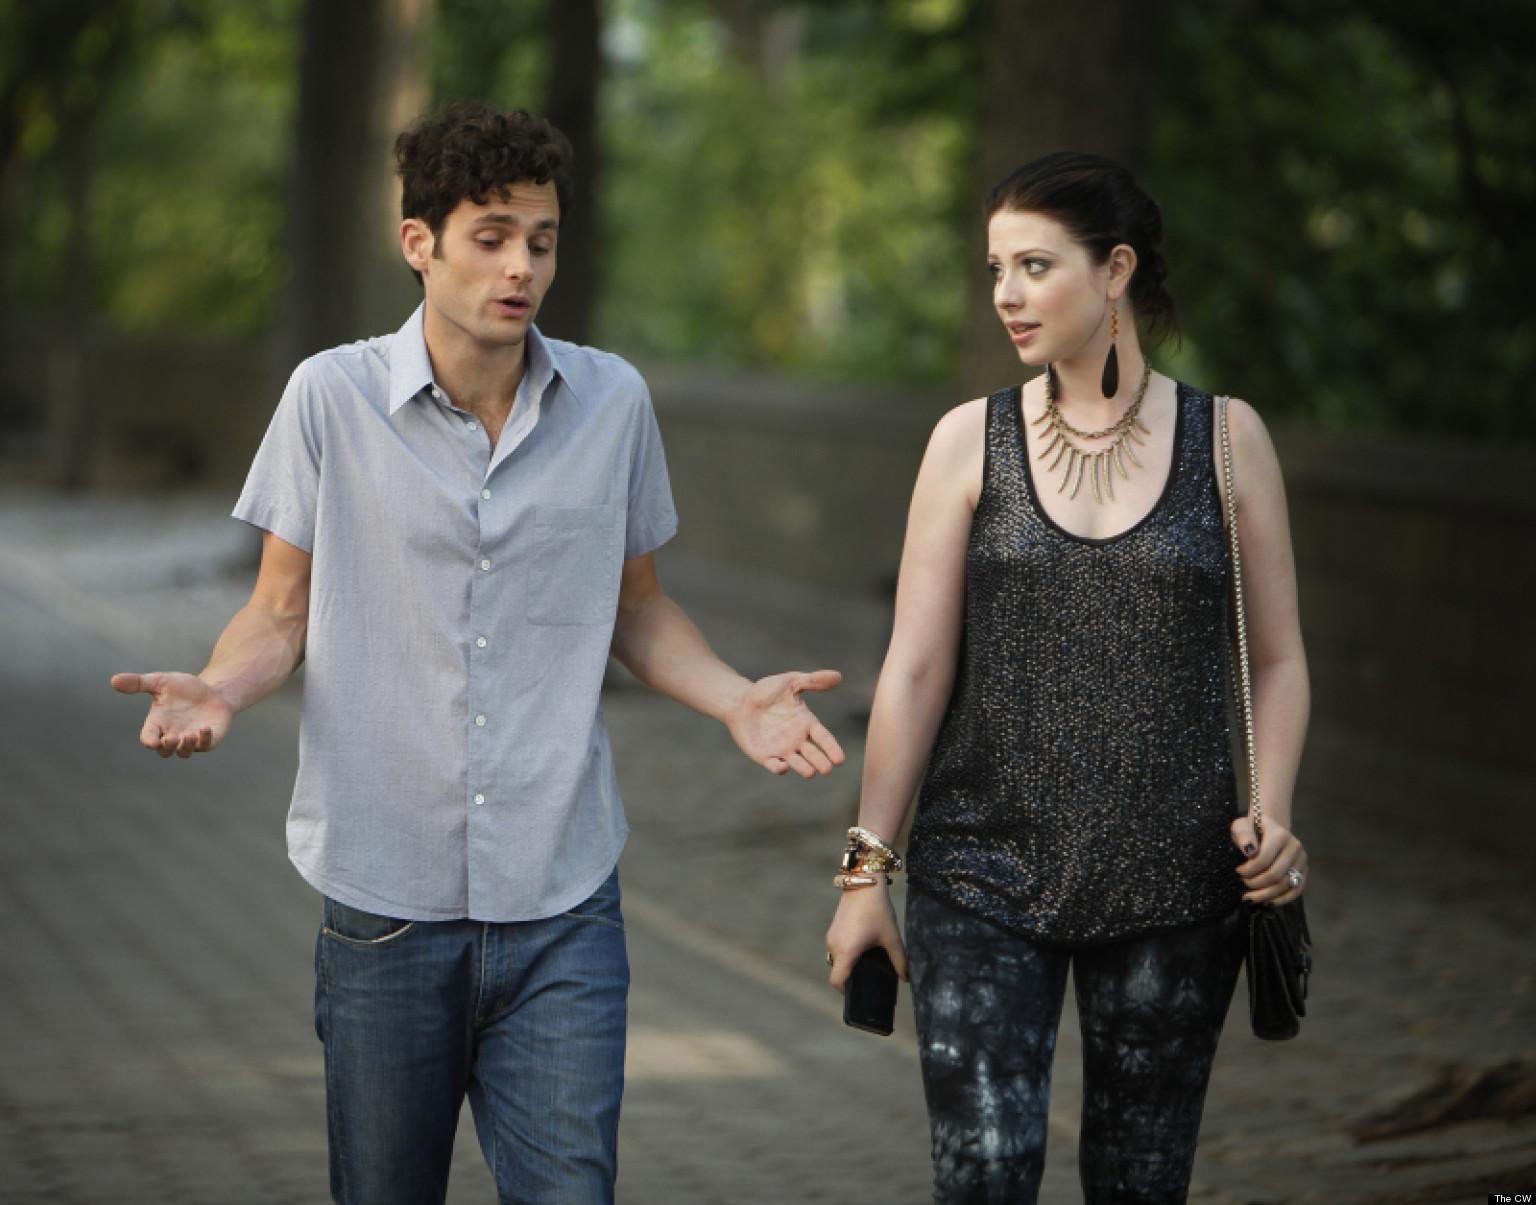 Watch Gossip Girl Season 2 Episode 15: Gone With the